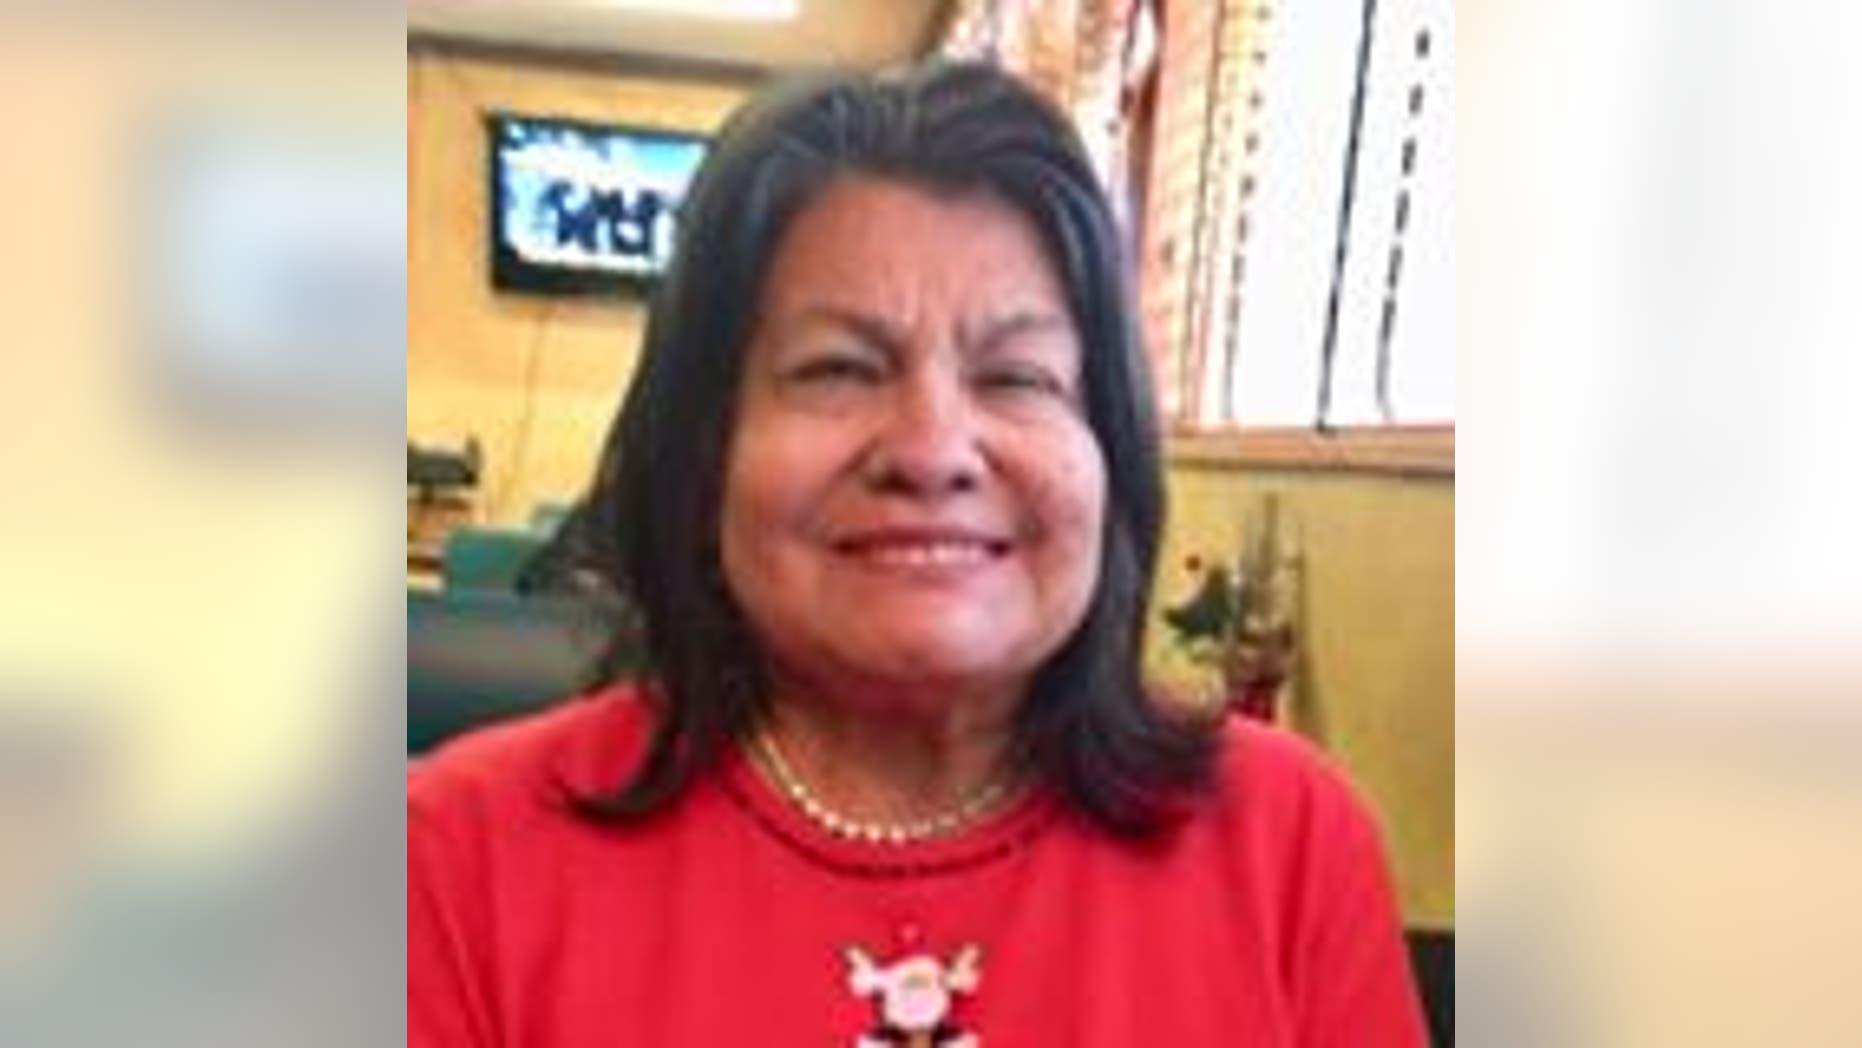 Olga Zuniga says her boss, a Texas judge, began monitoring her social media posts after Donald Trump became president.